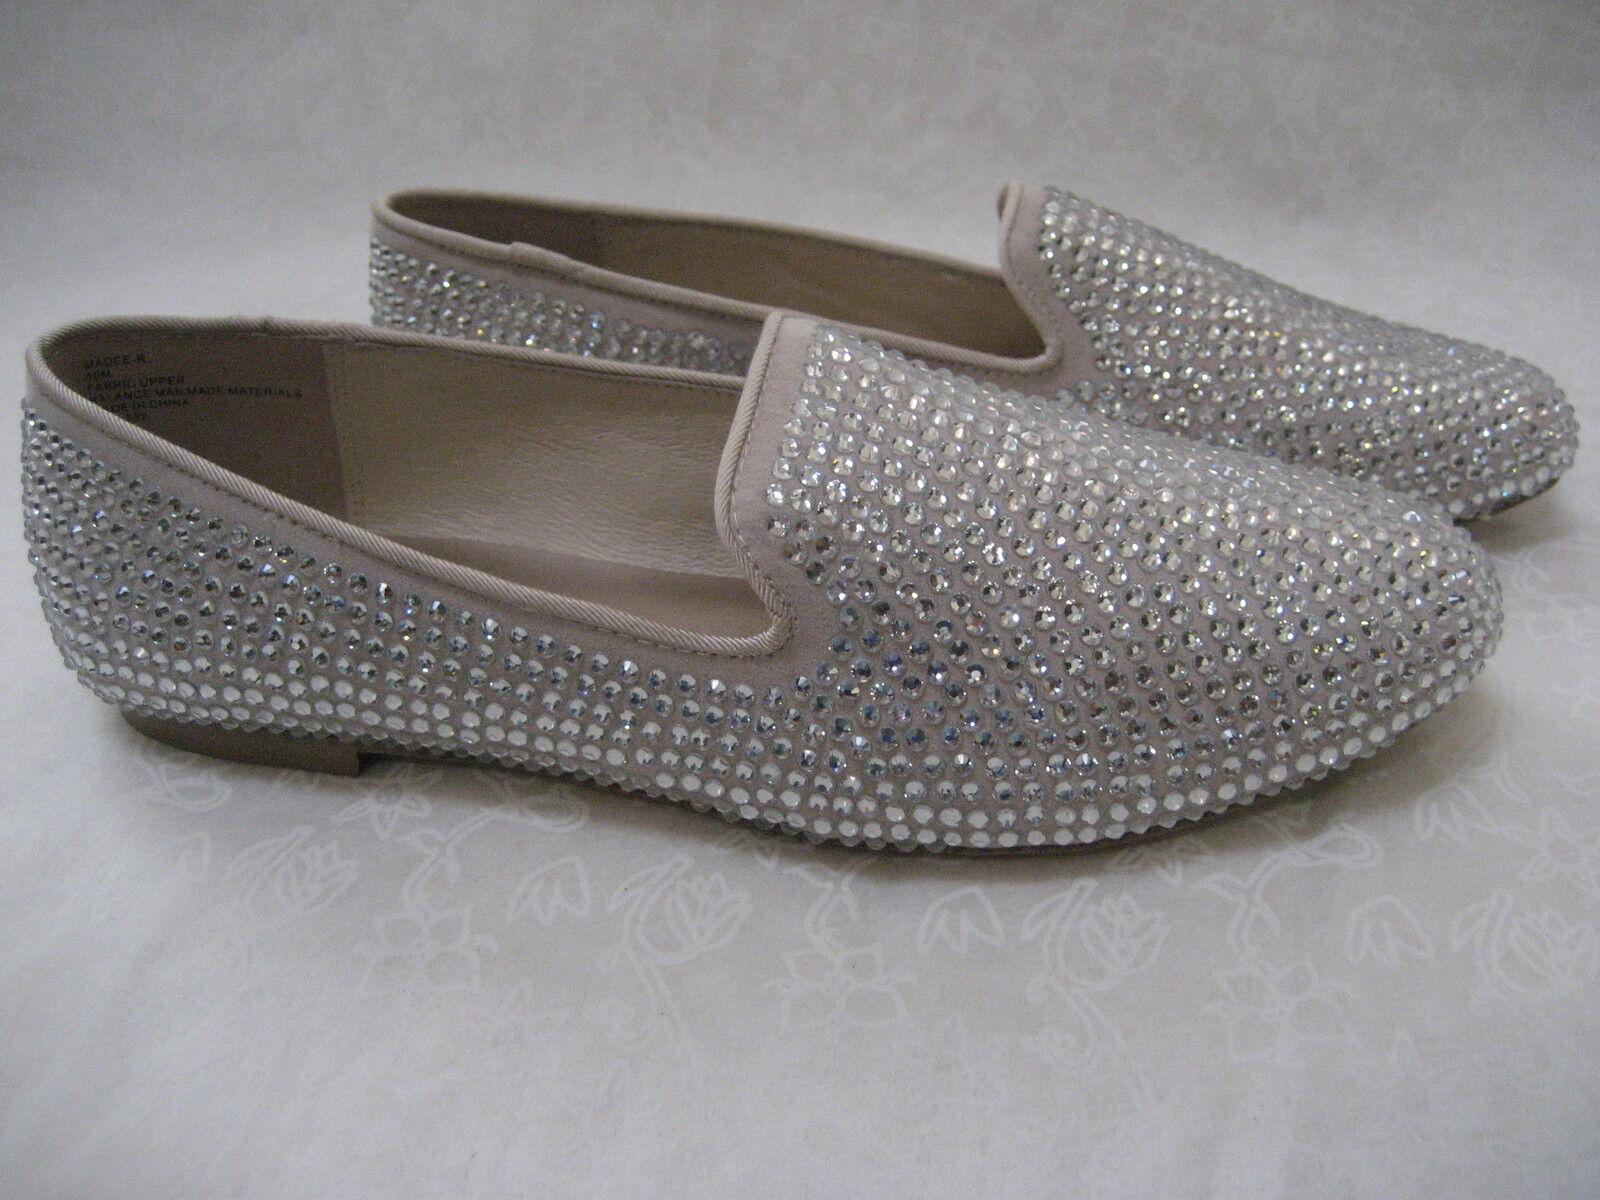 99 STEVEN BY STEVE MADDEN TAN RHINESTONE FLATS Schuhe SIZE 8 1/2 W - NEU